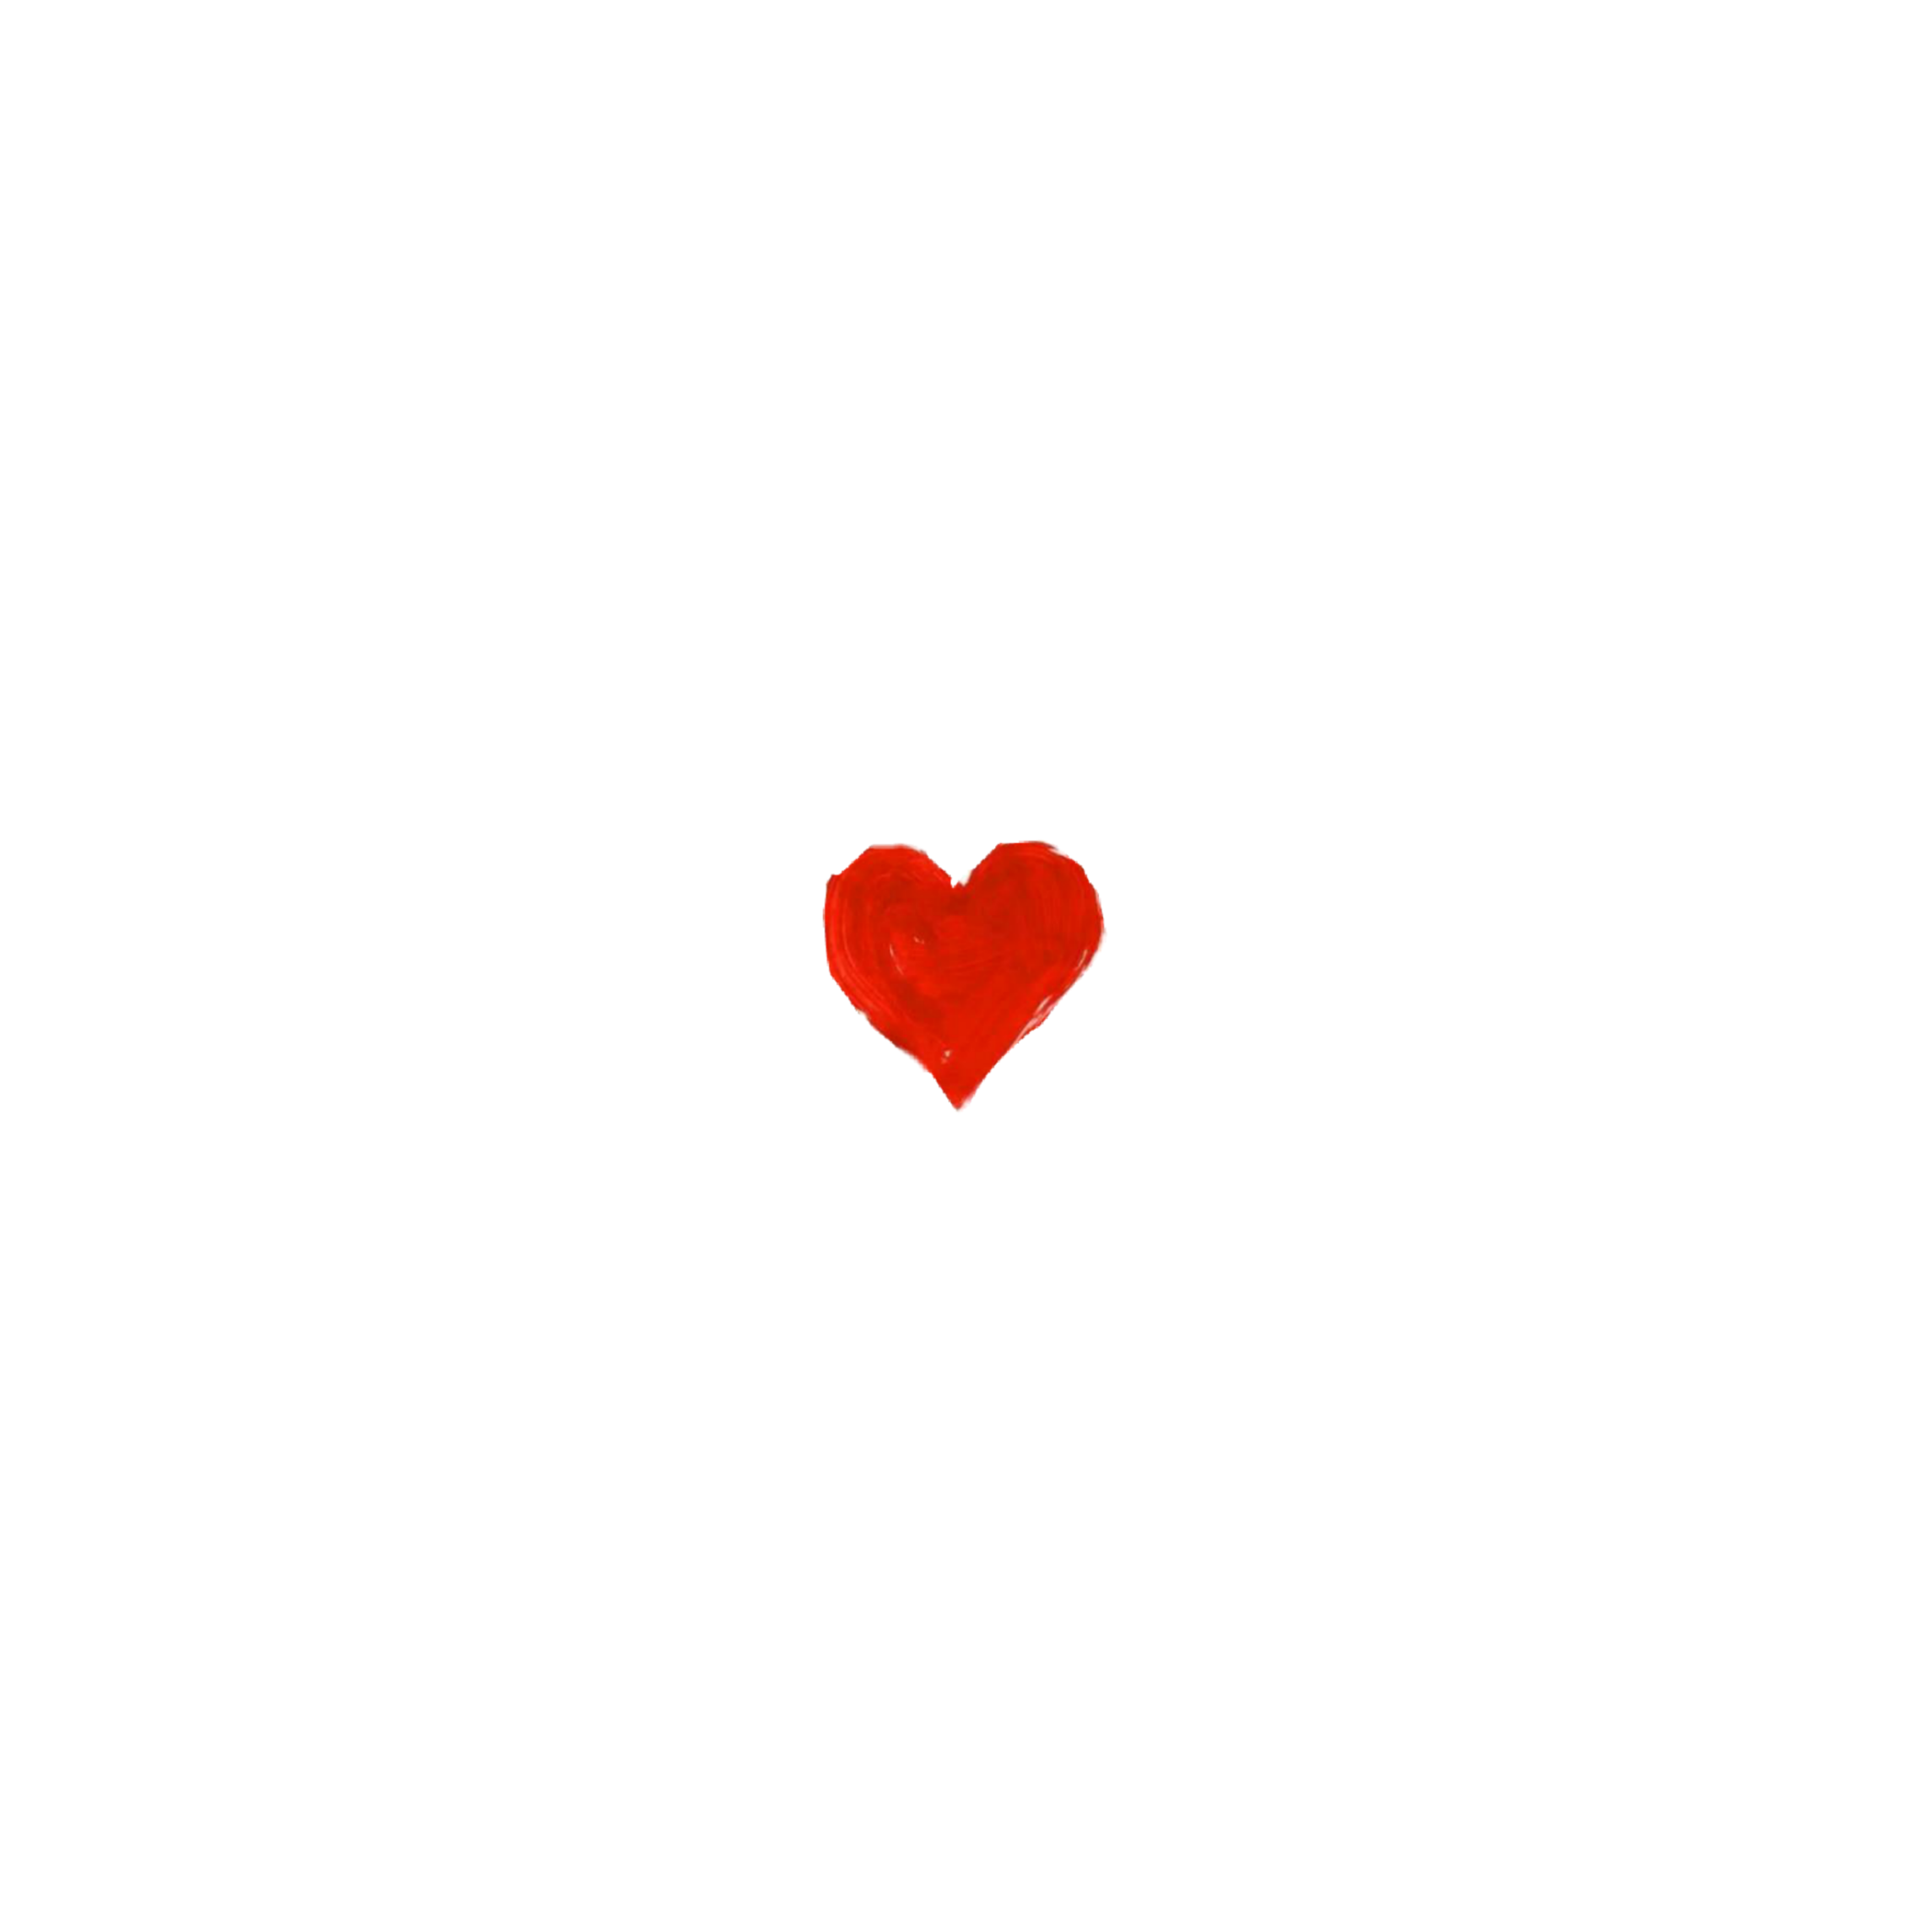 heart hearts red aesthetic aesthetics freetoedit